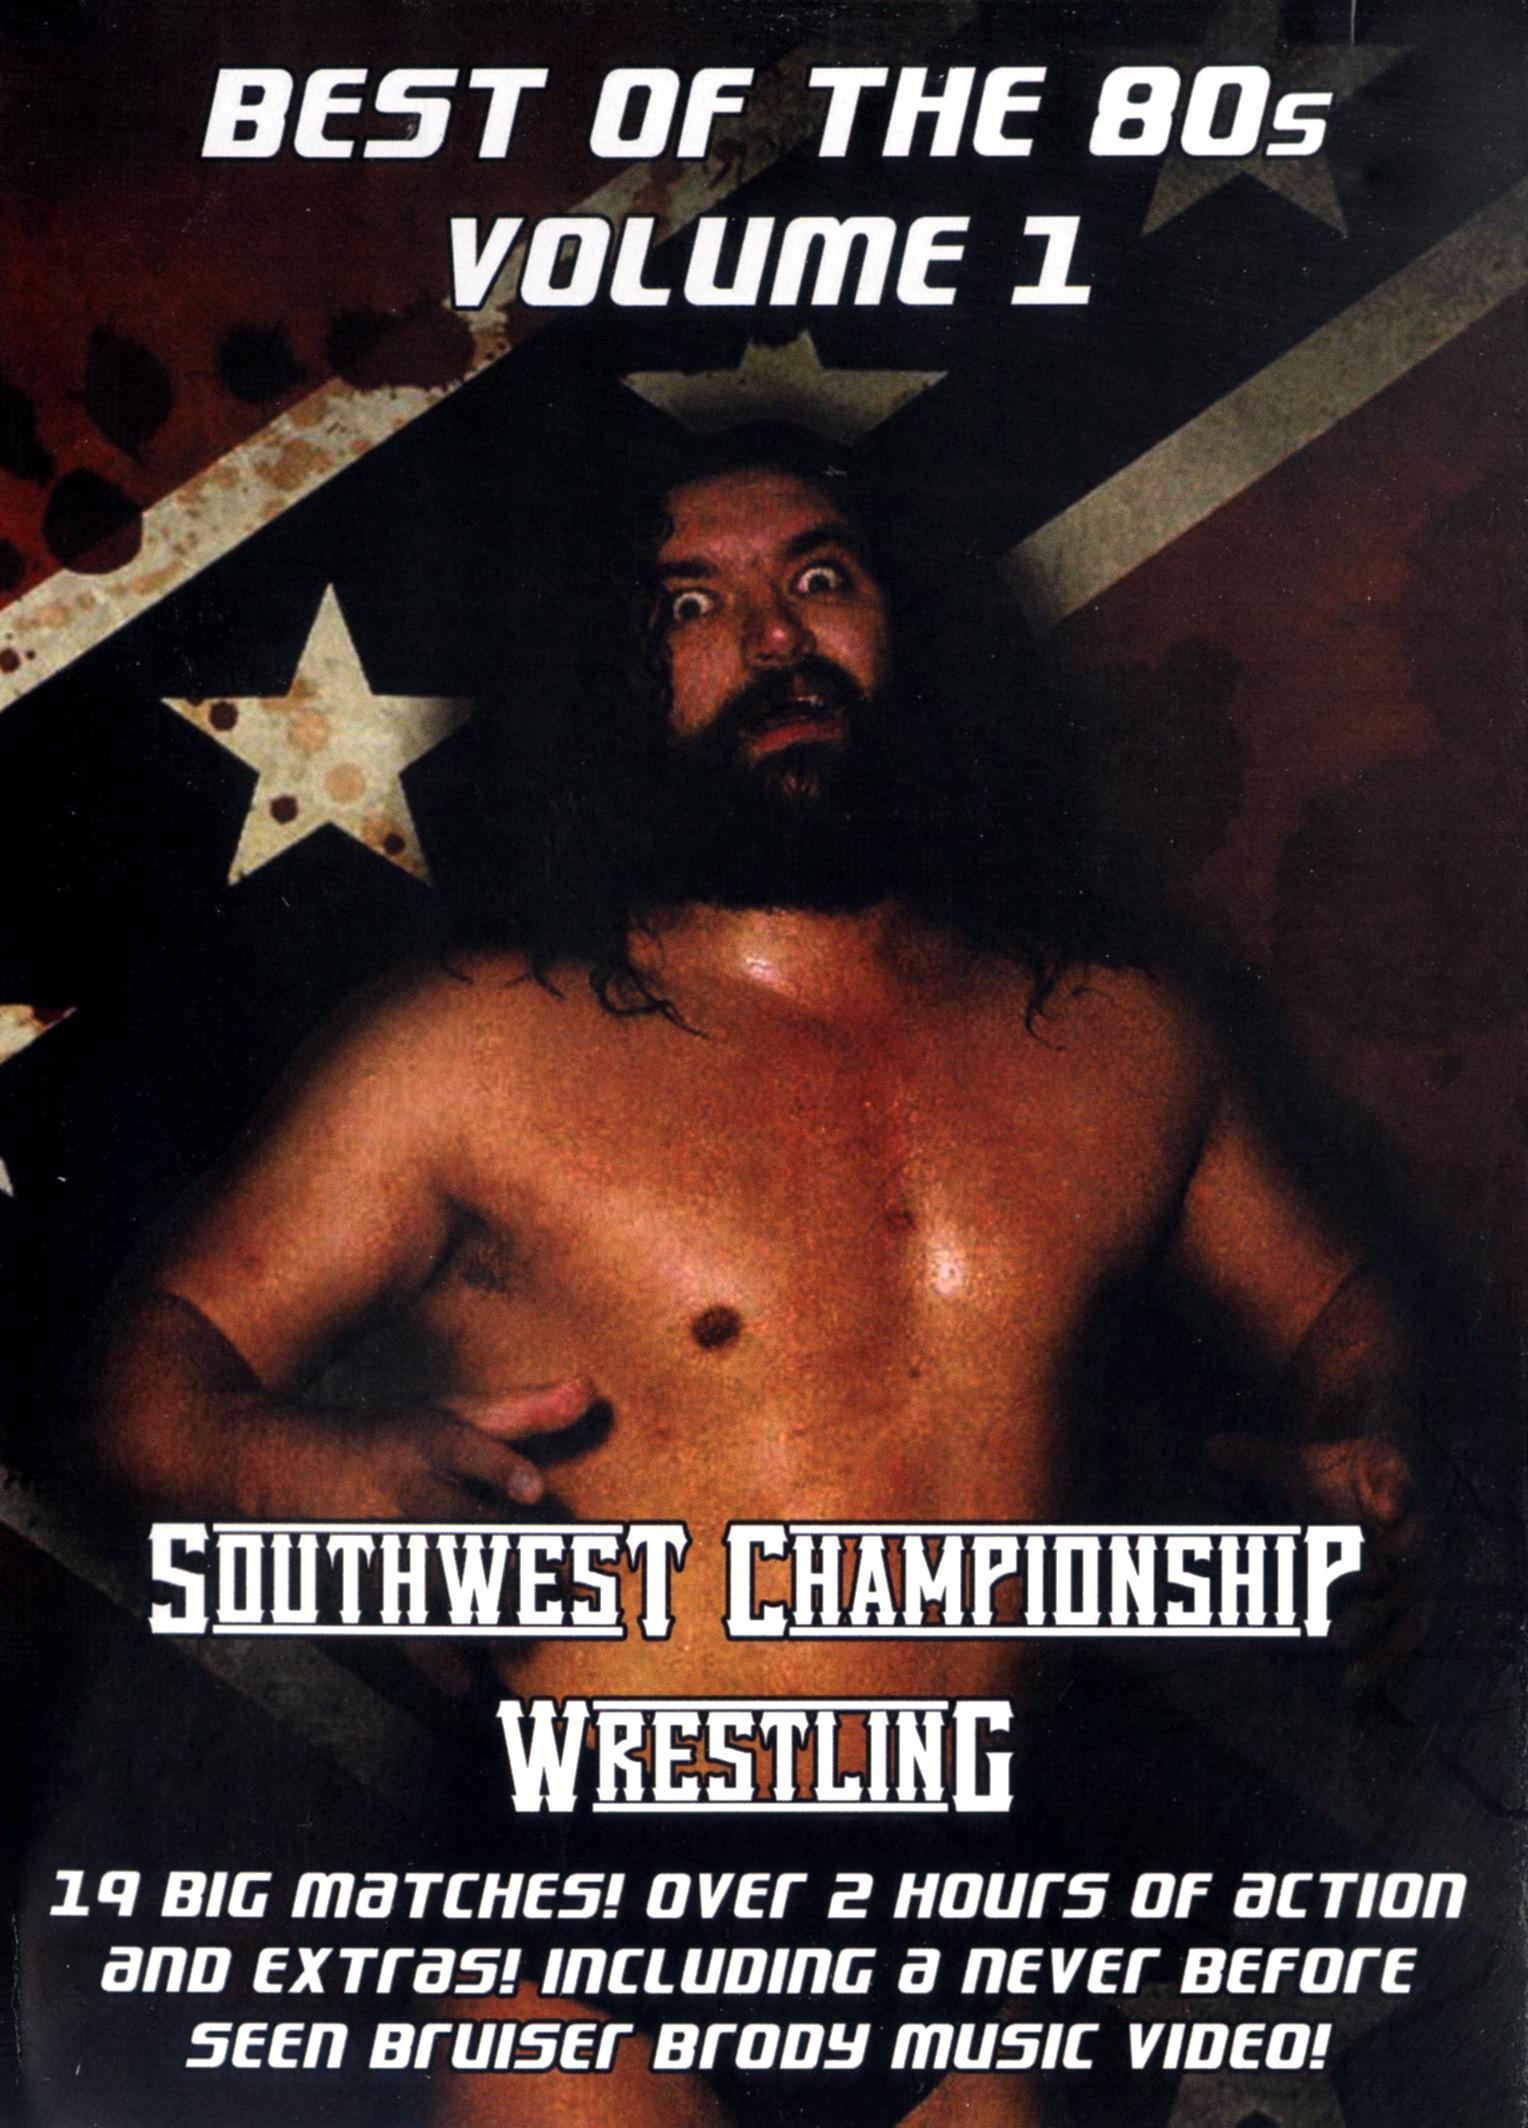 Southwest Championship Wrestling: Best of the '80s, Vol. 1